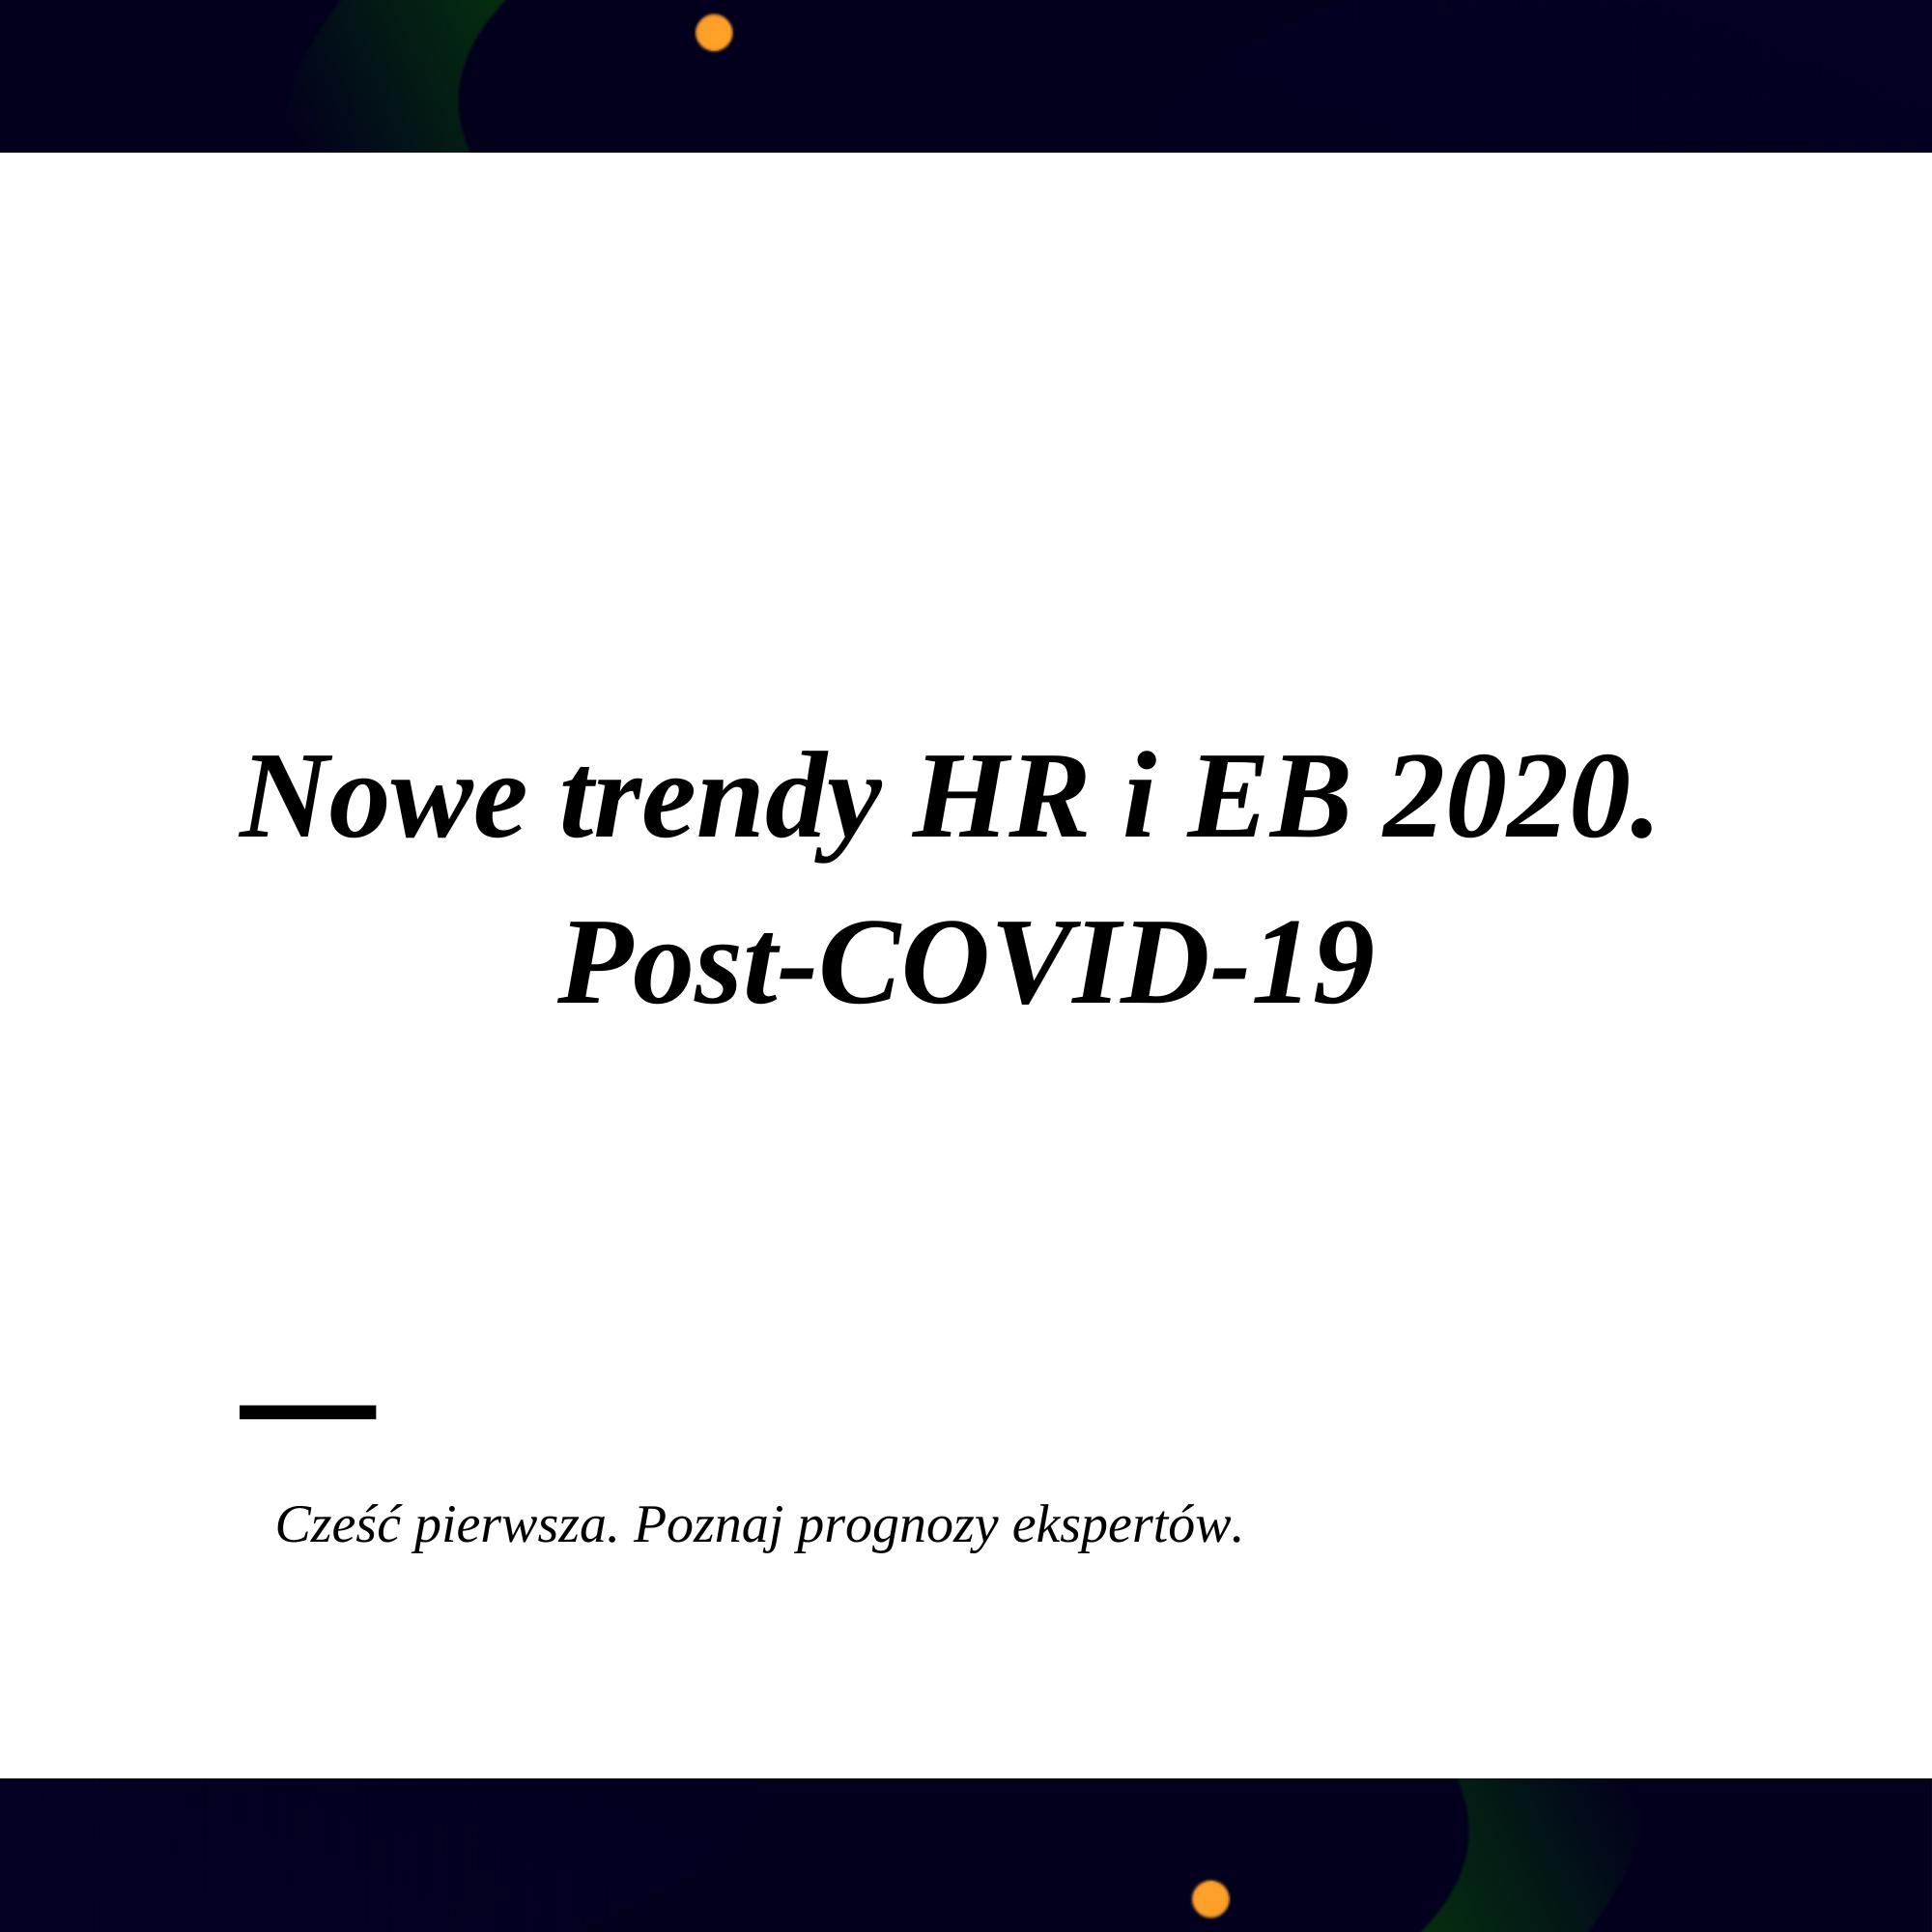 Nowe trendy HB i EB 2020. Post-COVID-19 (1)